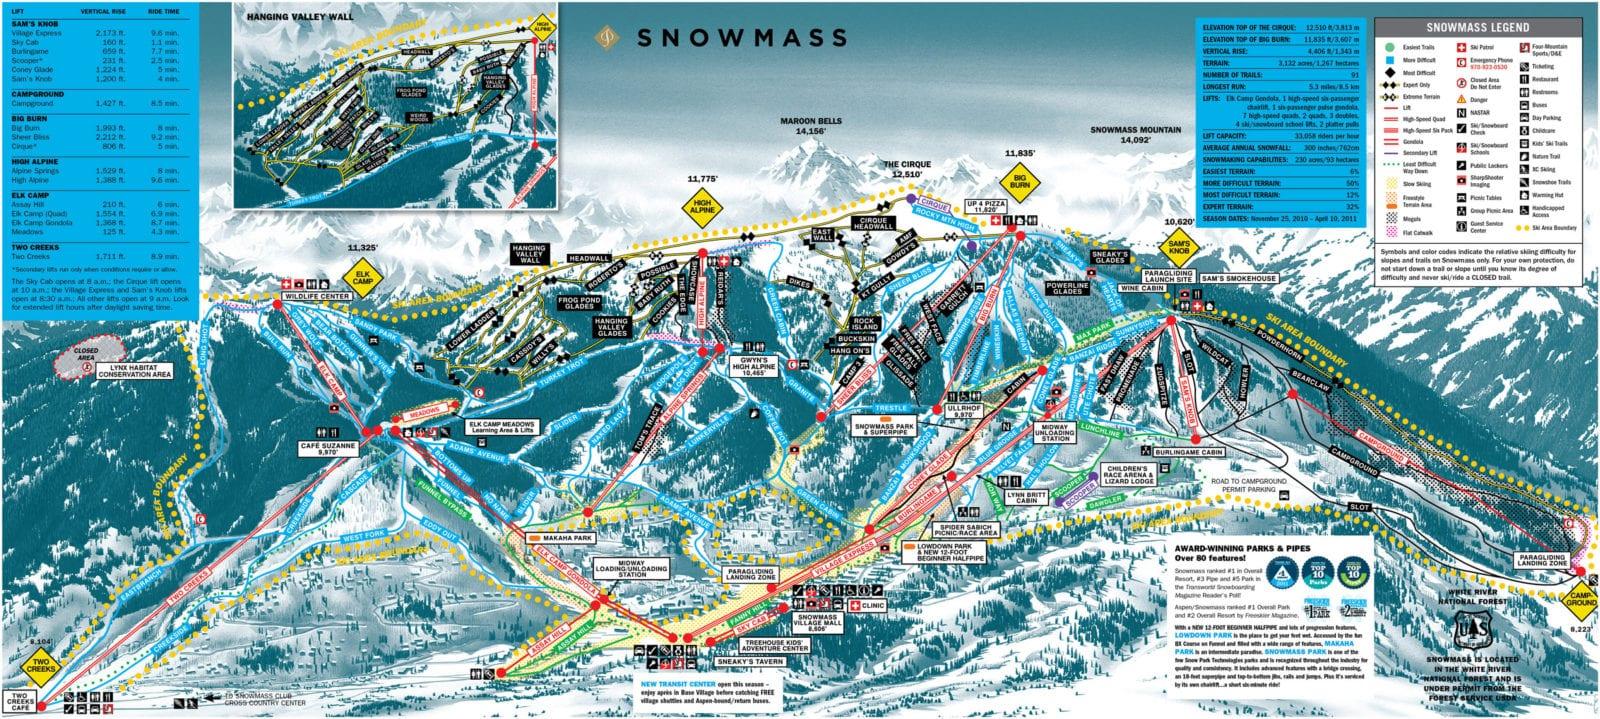 Snowmass Mountain Ski Resort Breckenridge Co Snowmass